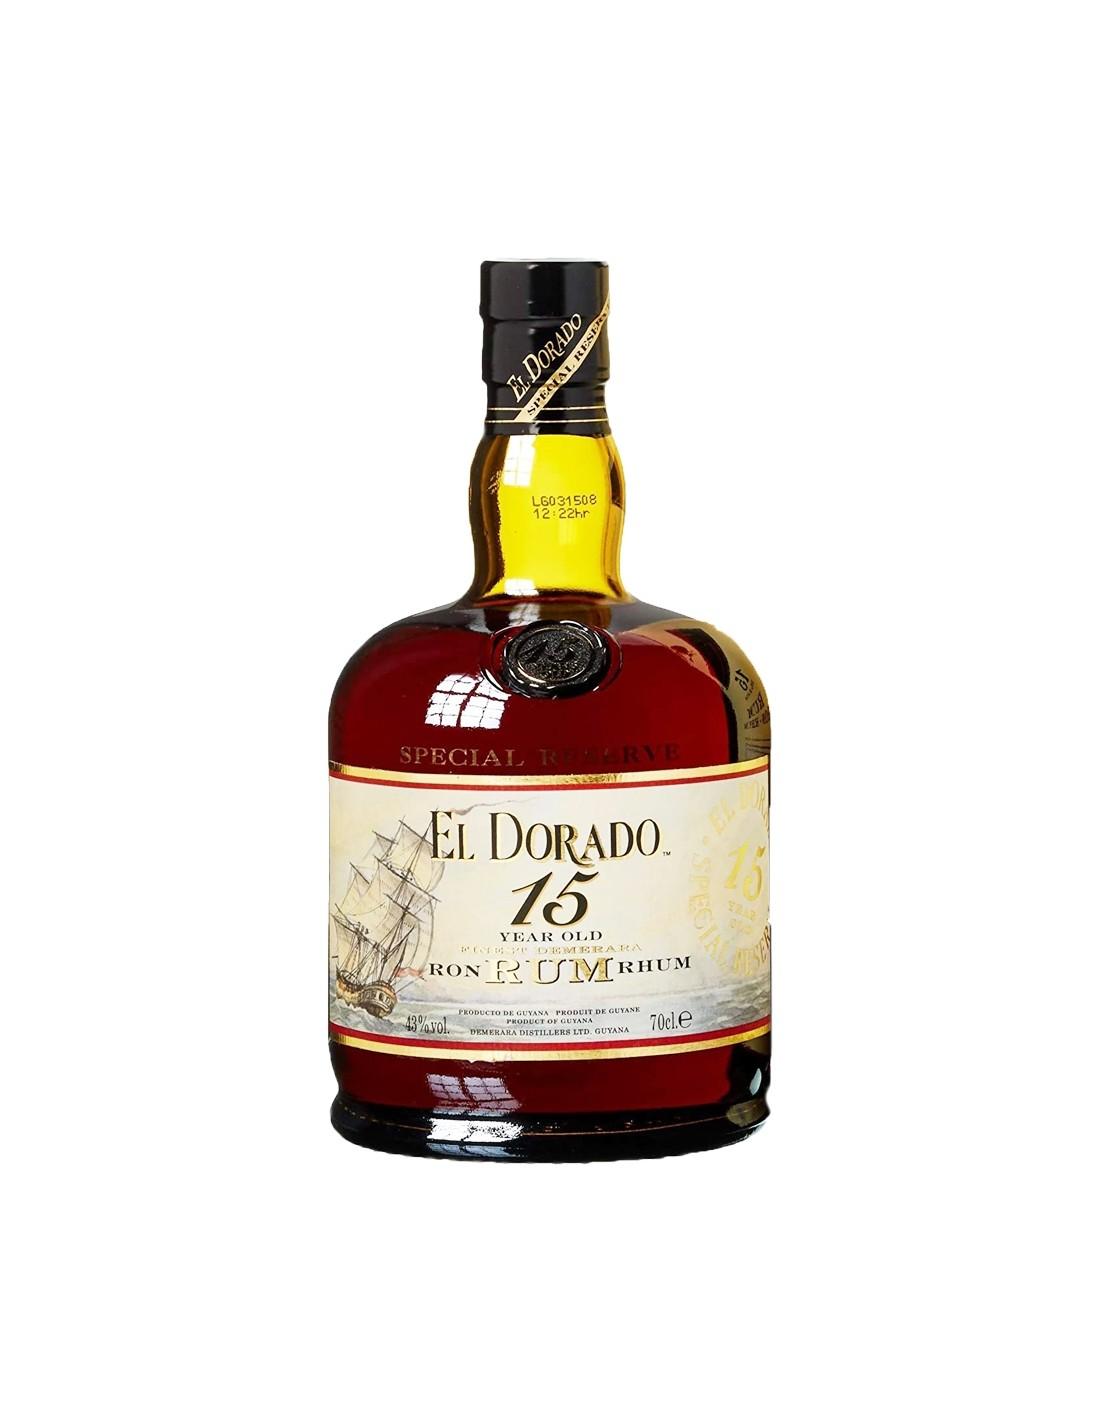 Rom El Dorado Special, 15 ani, 43% alc., 0.7L, Guyana